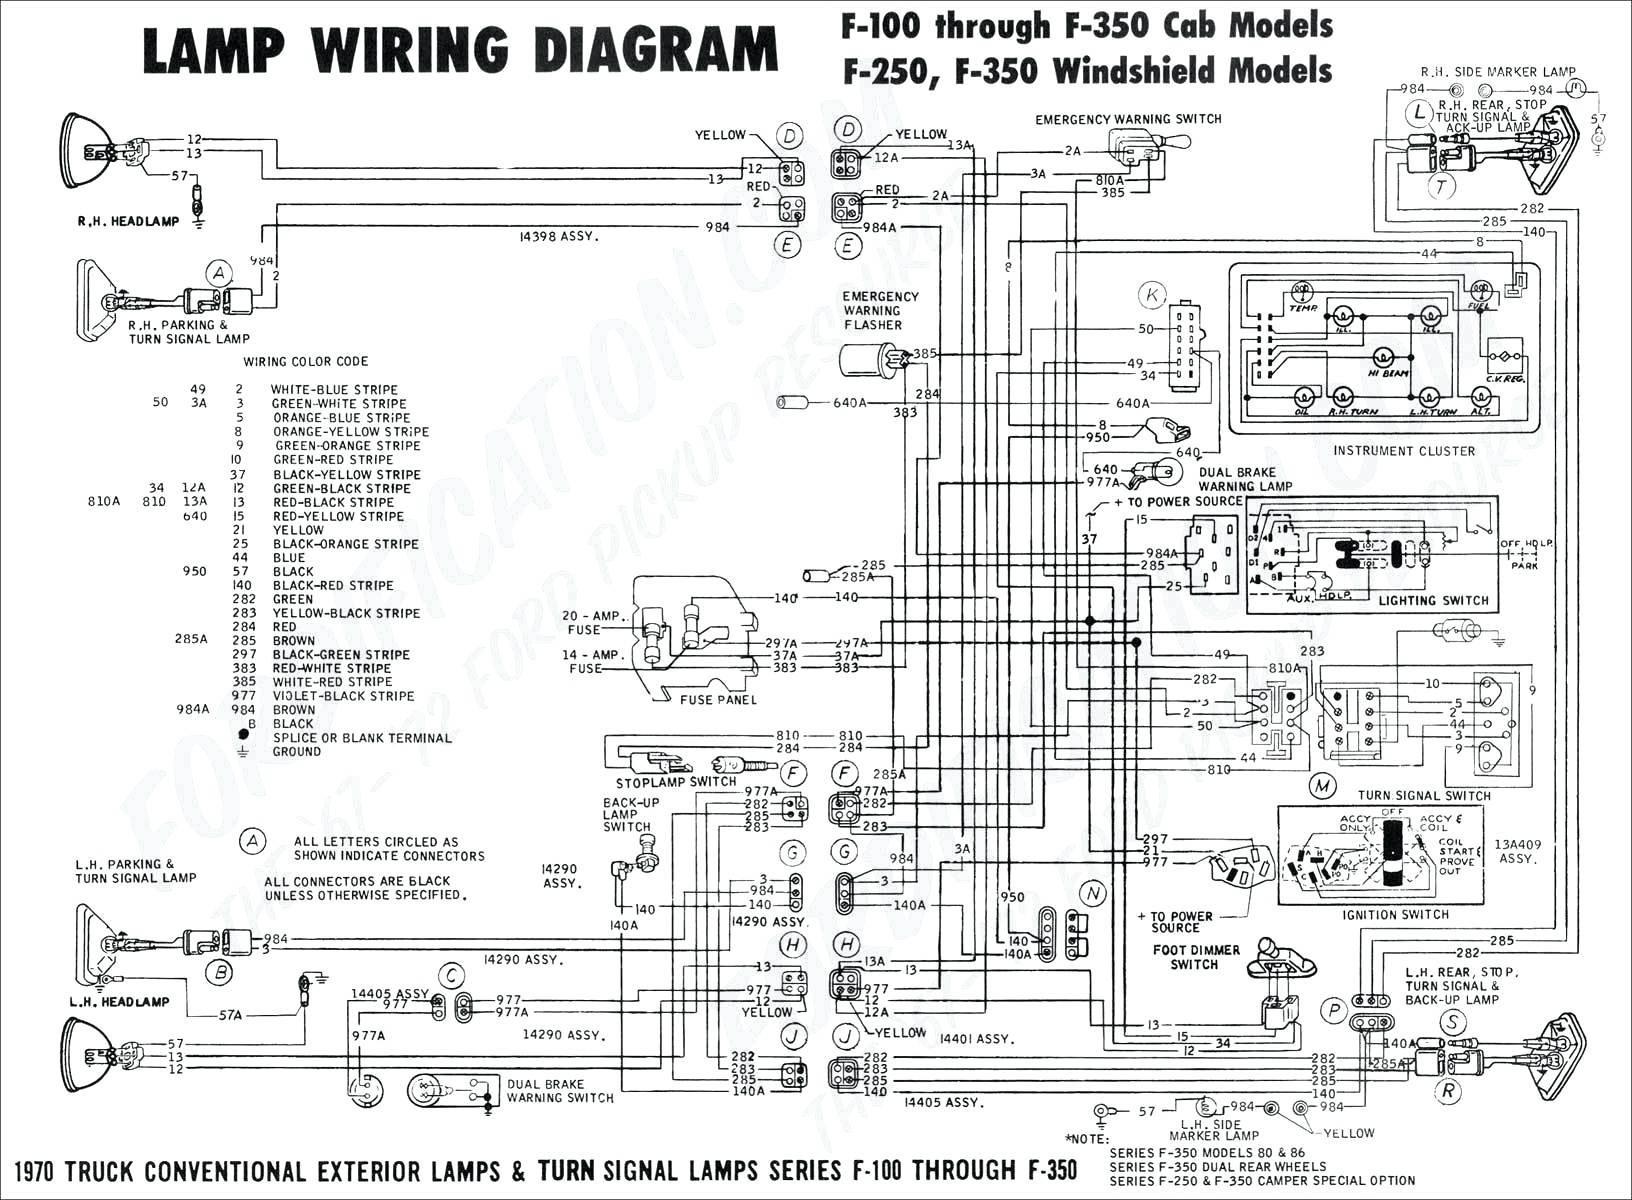 2000 ford escort zx2 engine diagram wiring diagrams